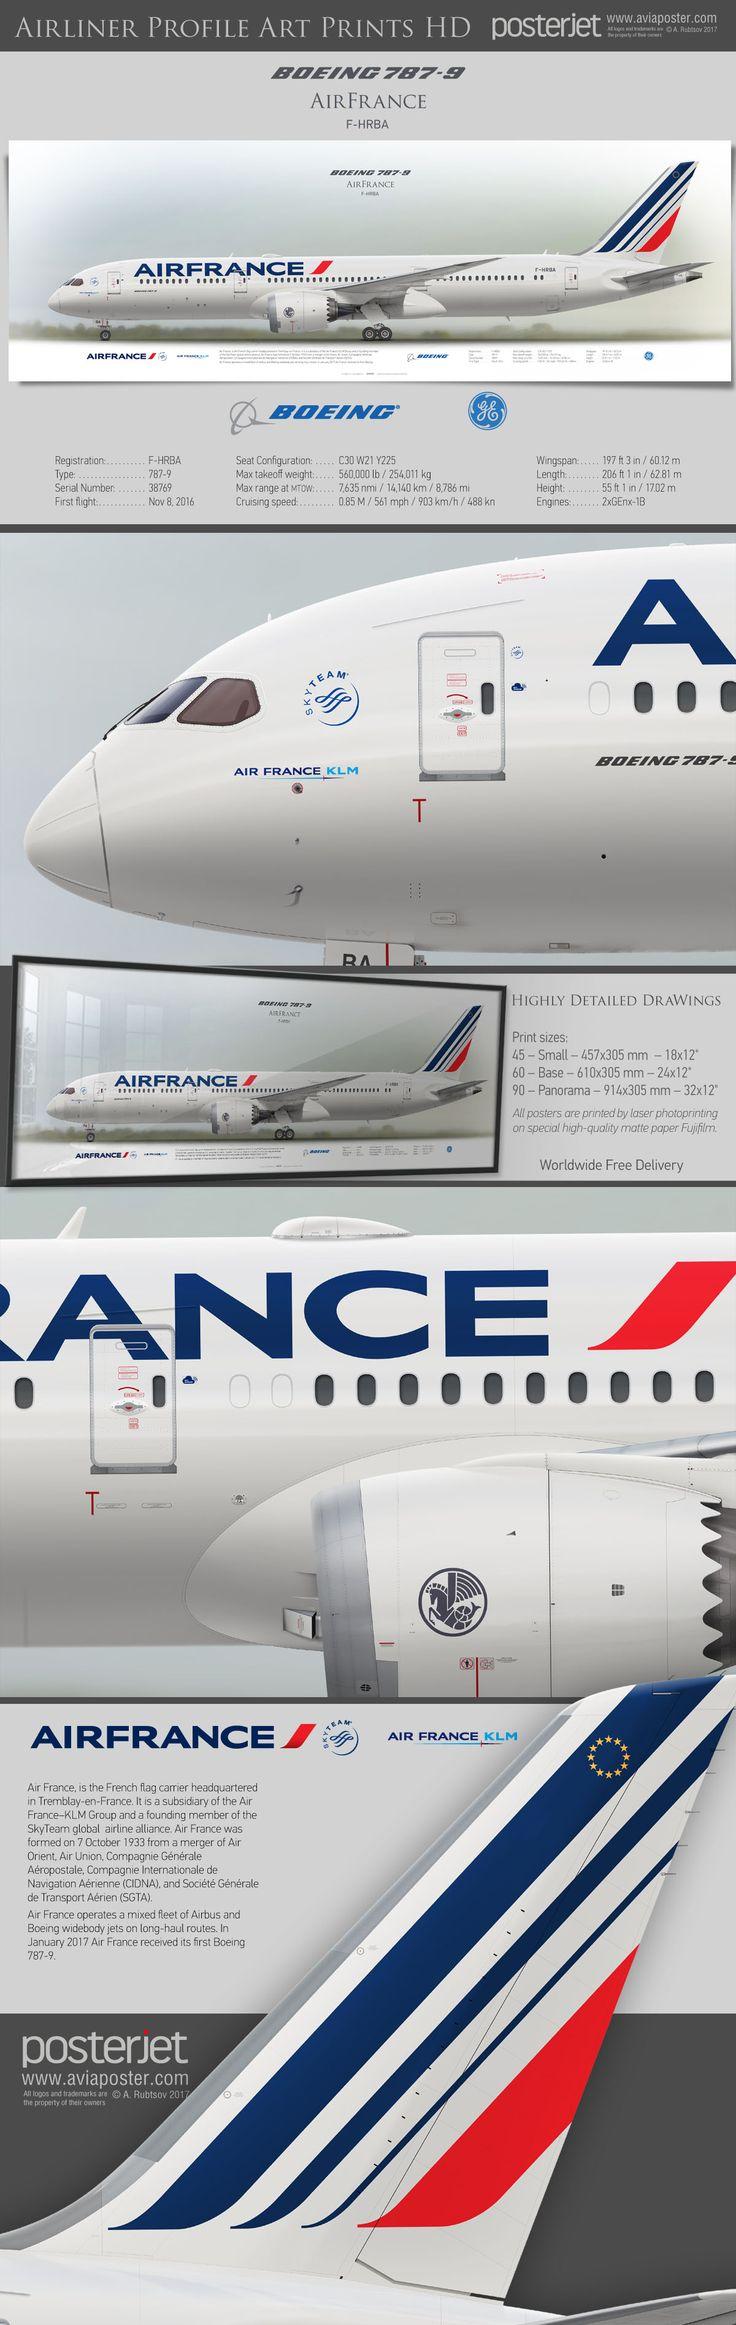 Boeing 787-9 Air France F-HRBA   www.aviaposter.com   #airliners #aviation #jetliner #airplane #pilot #aviationlovers #avgeek #jet #airport #pilotlife #cabincrew #dreamliner